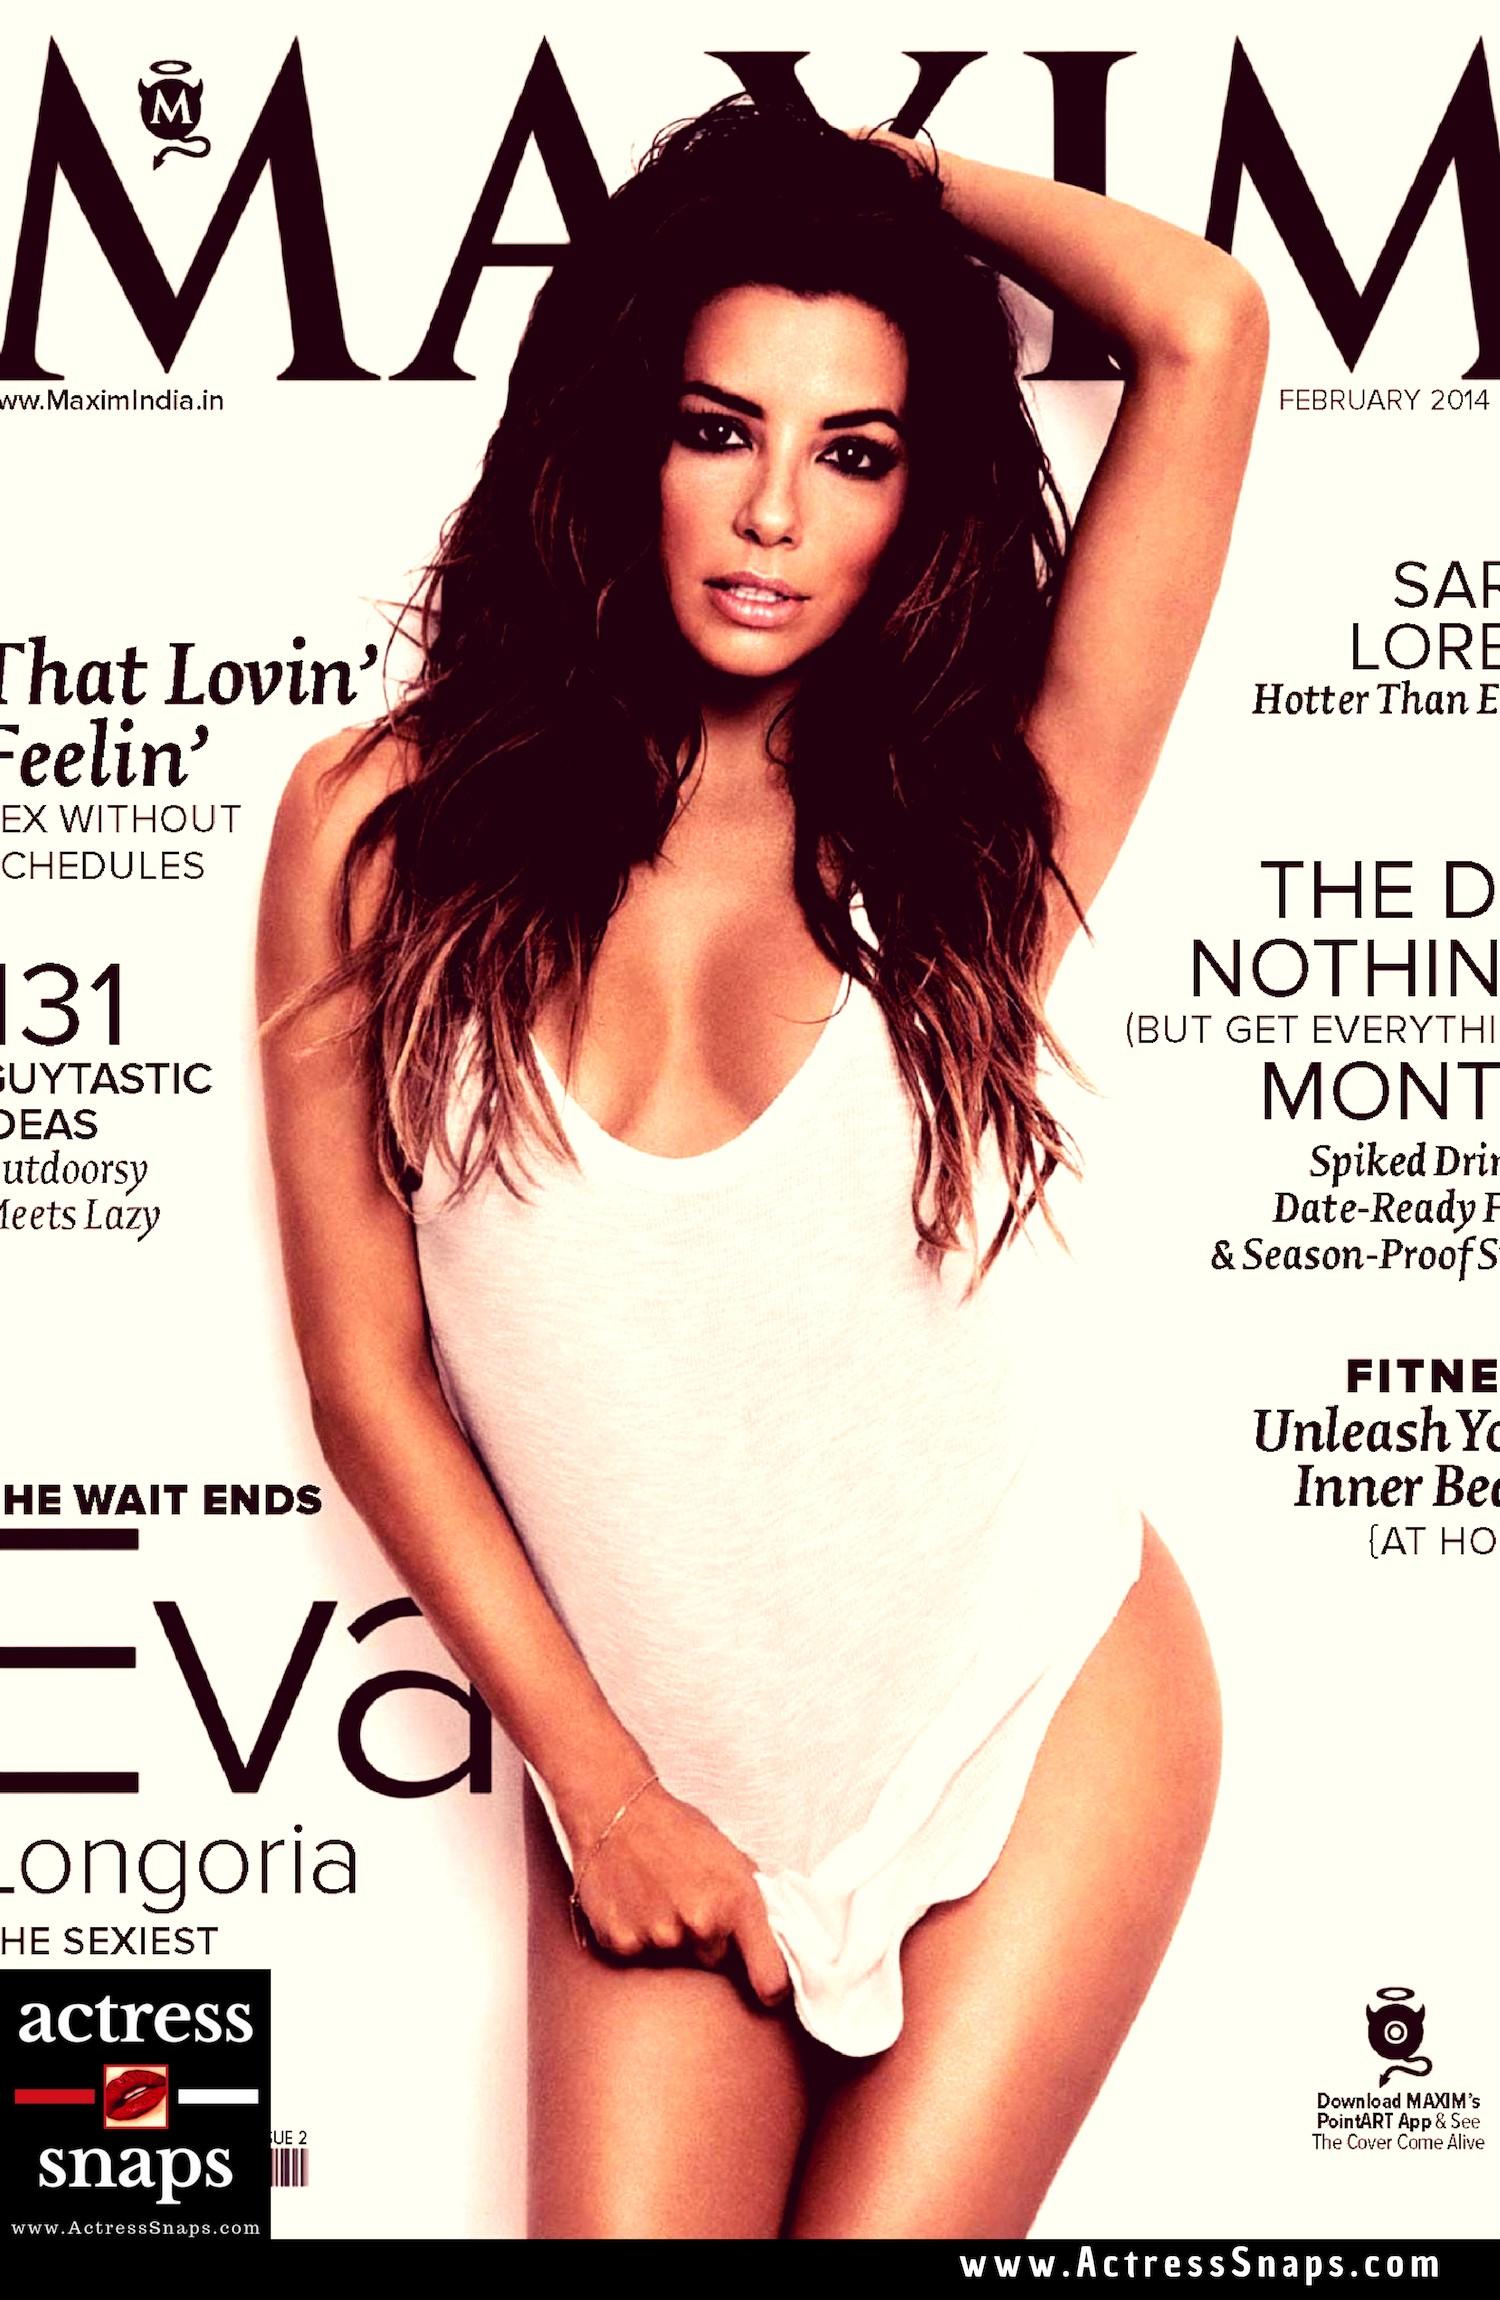 Eva Longoria - Maxim Photo Shoot Pictures - Sexy Actress Pictures | Hot Actress Pictures - ActressSnaps.com